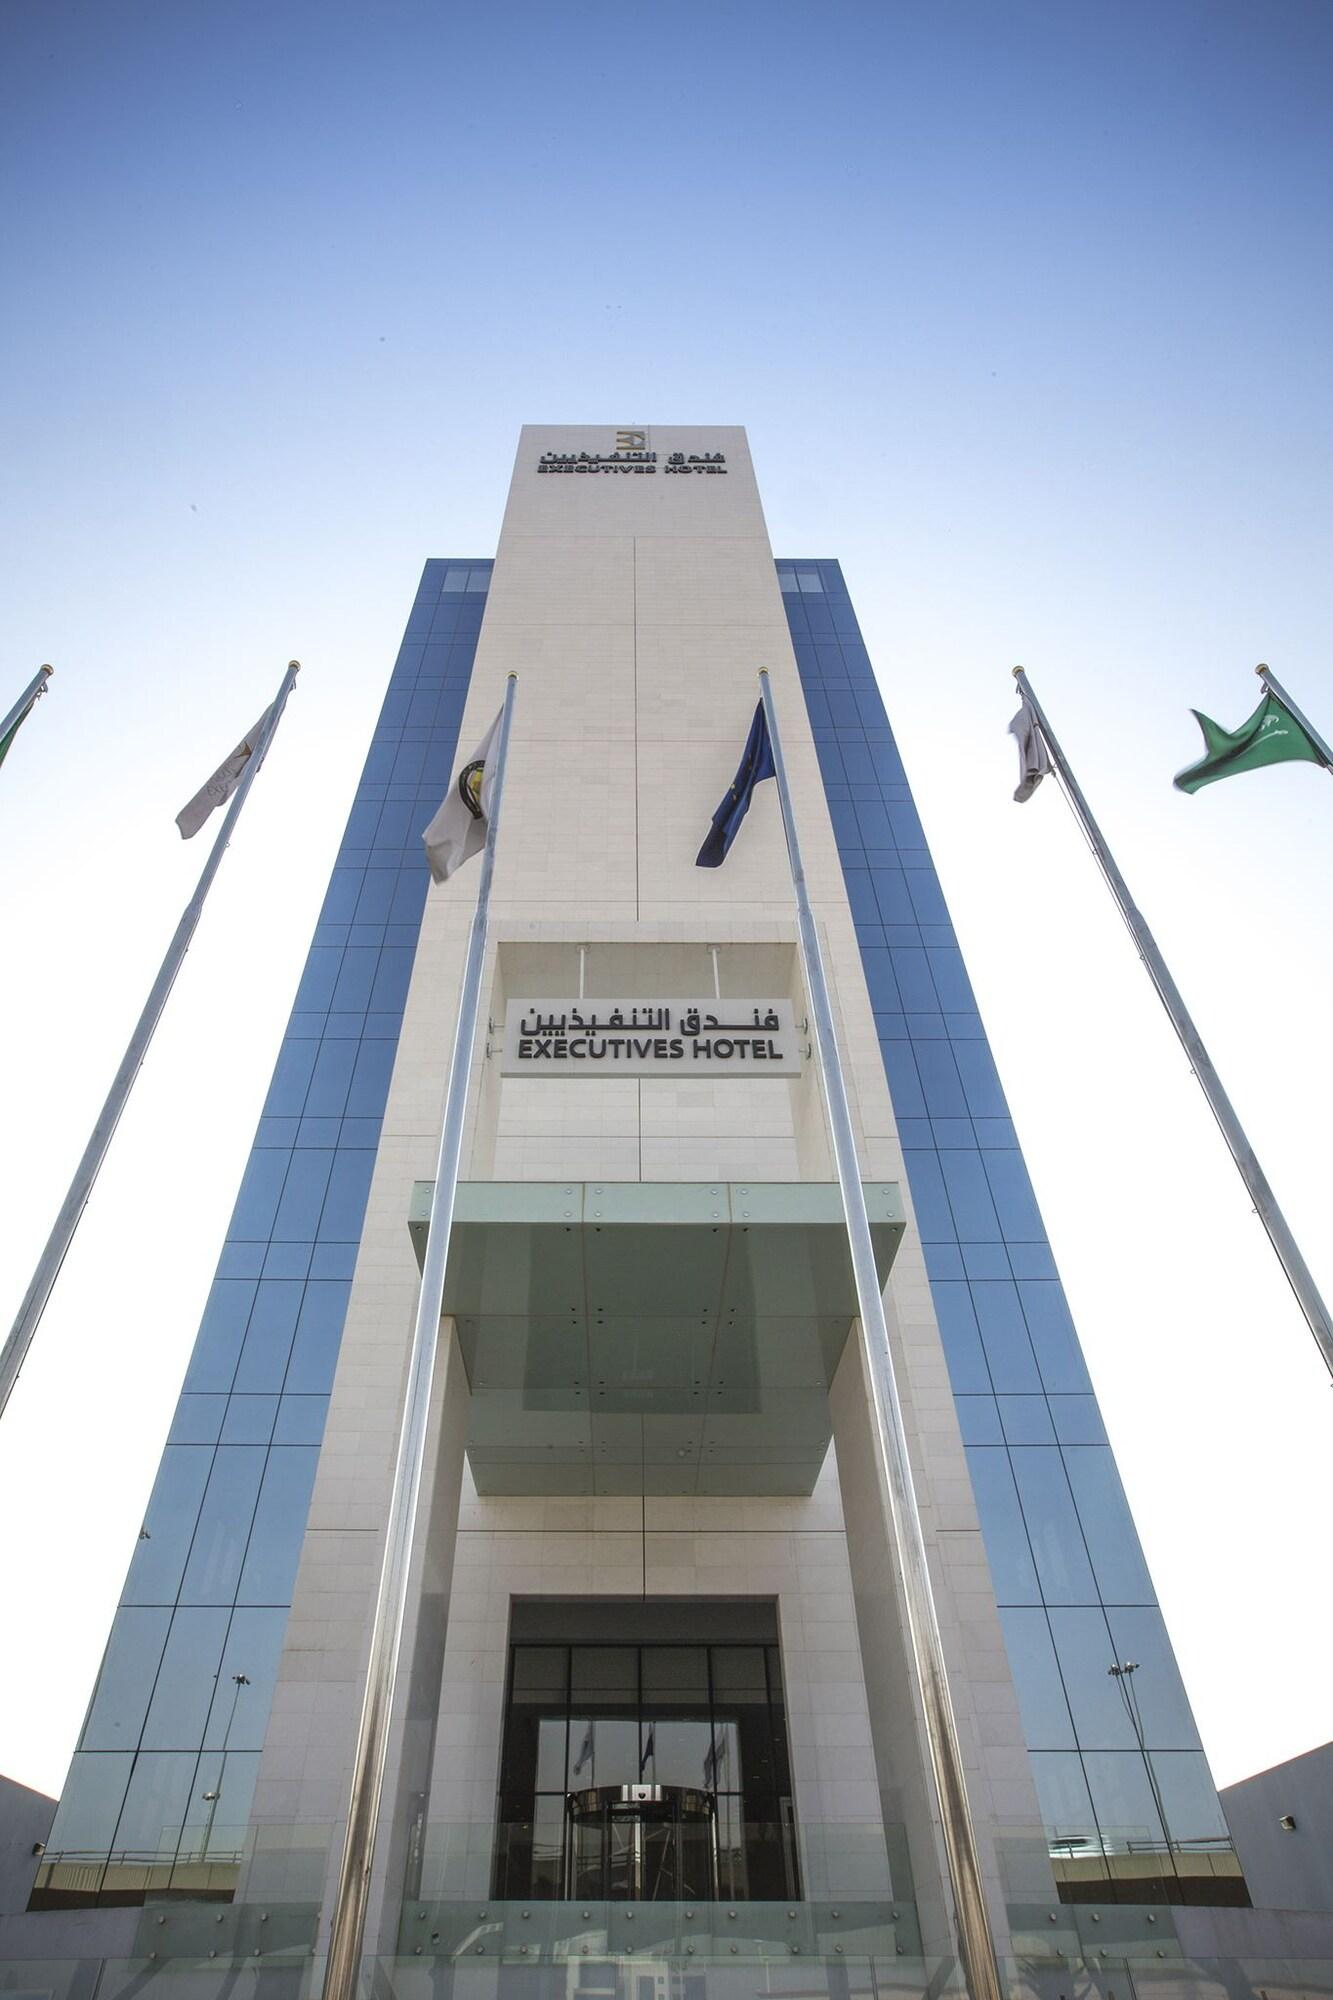 Executives Hotel Kafd 8 950 1 7 6 9 0 Riyadh